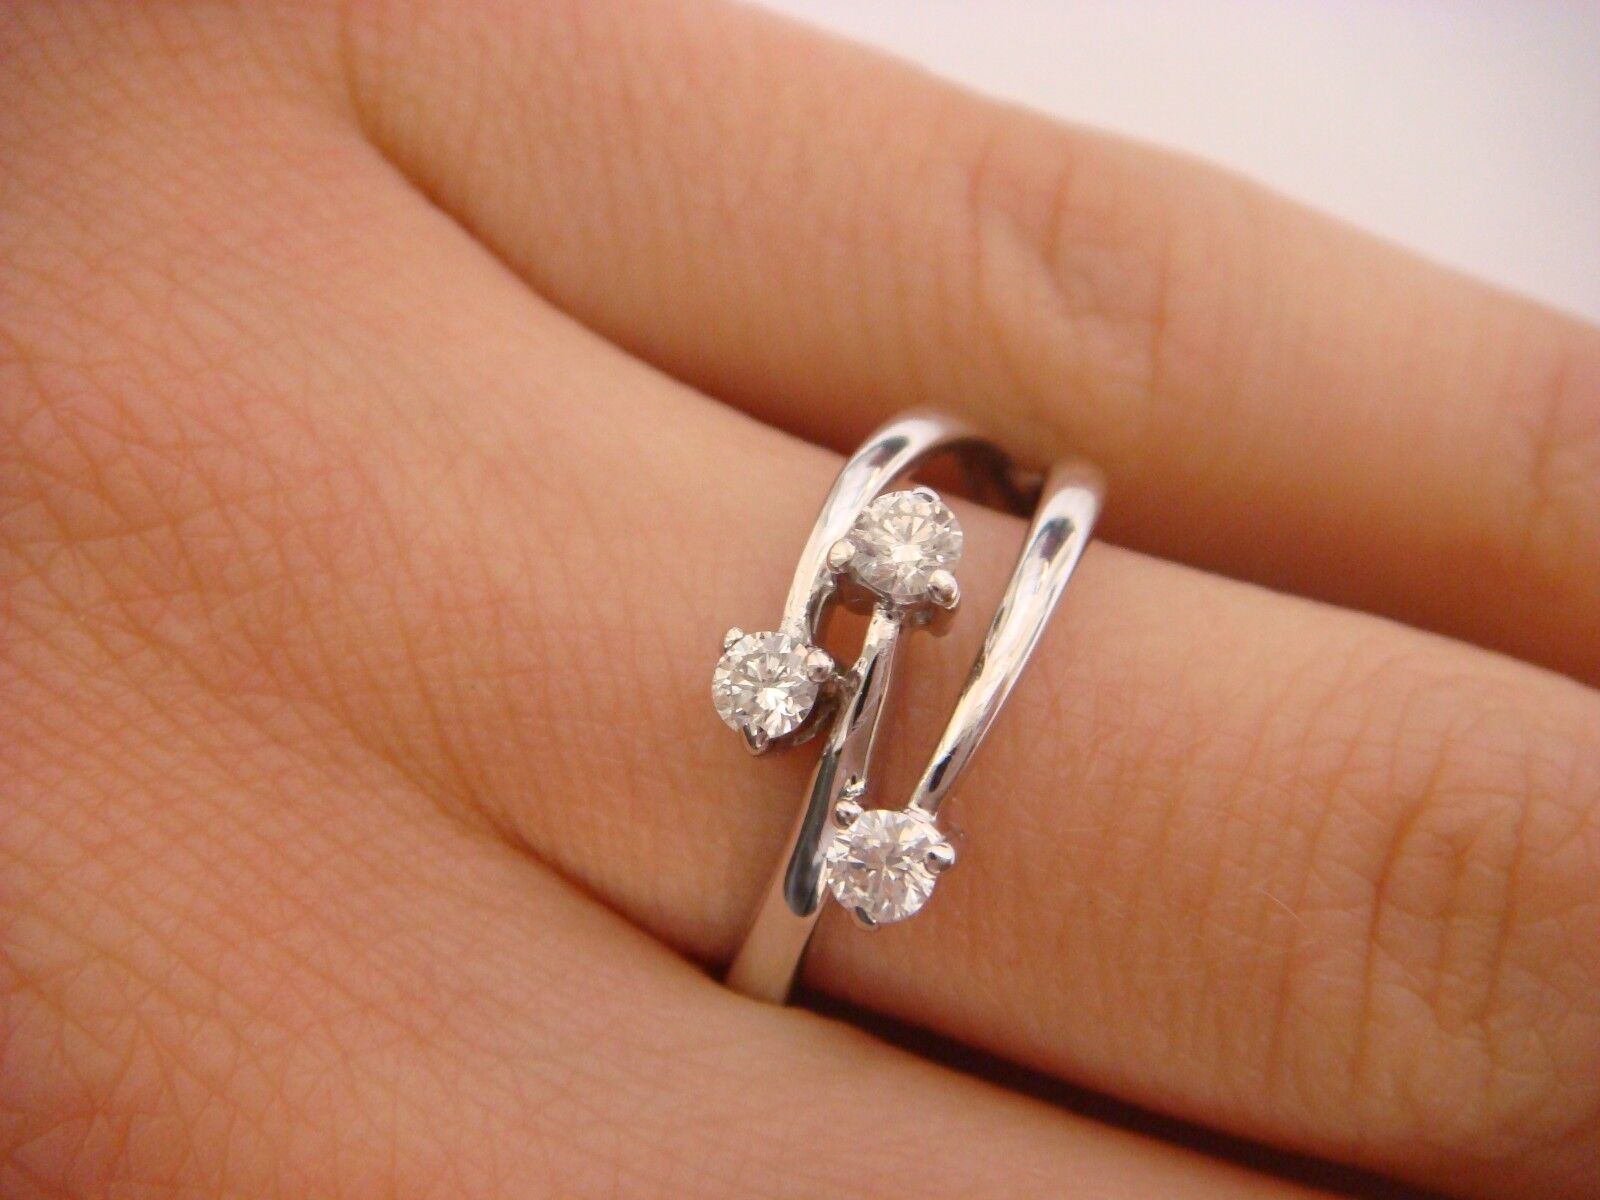 14K WHITE gold 3 DIAMONDS LADIES RING 0.30 CT T.W. 2.6 GRAMS SIZE 7